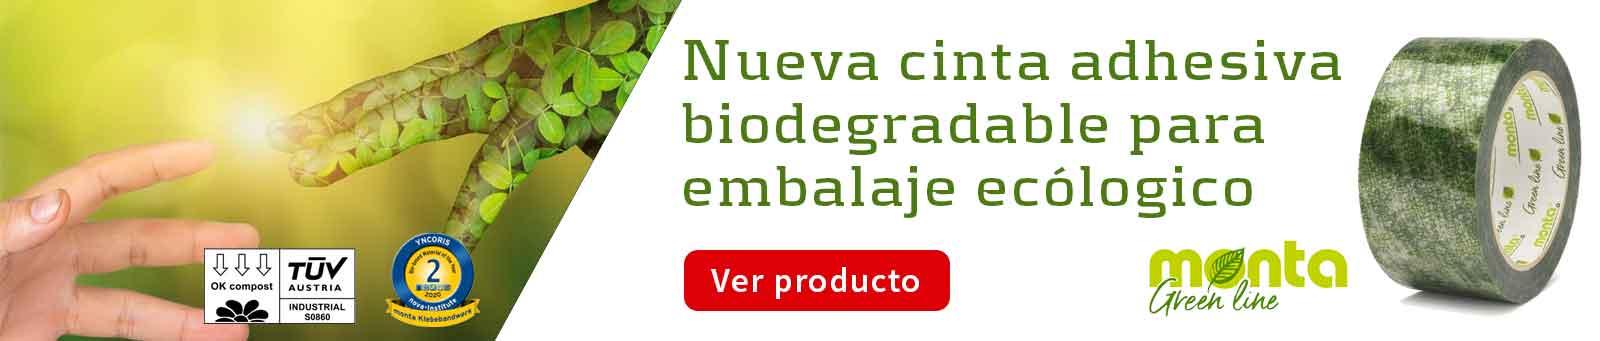 Cinta adhesiva biodegradable compostable para embalaje ecológico